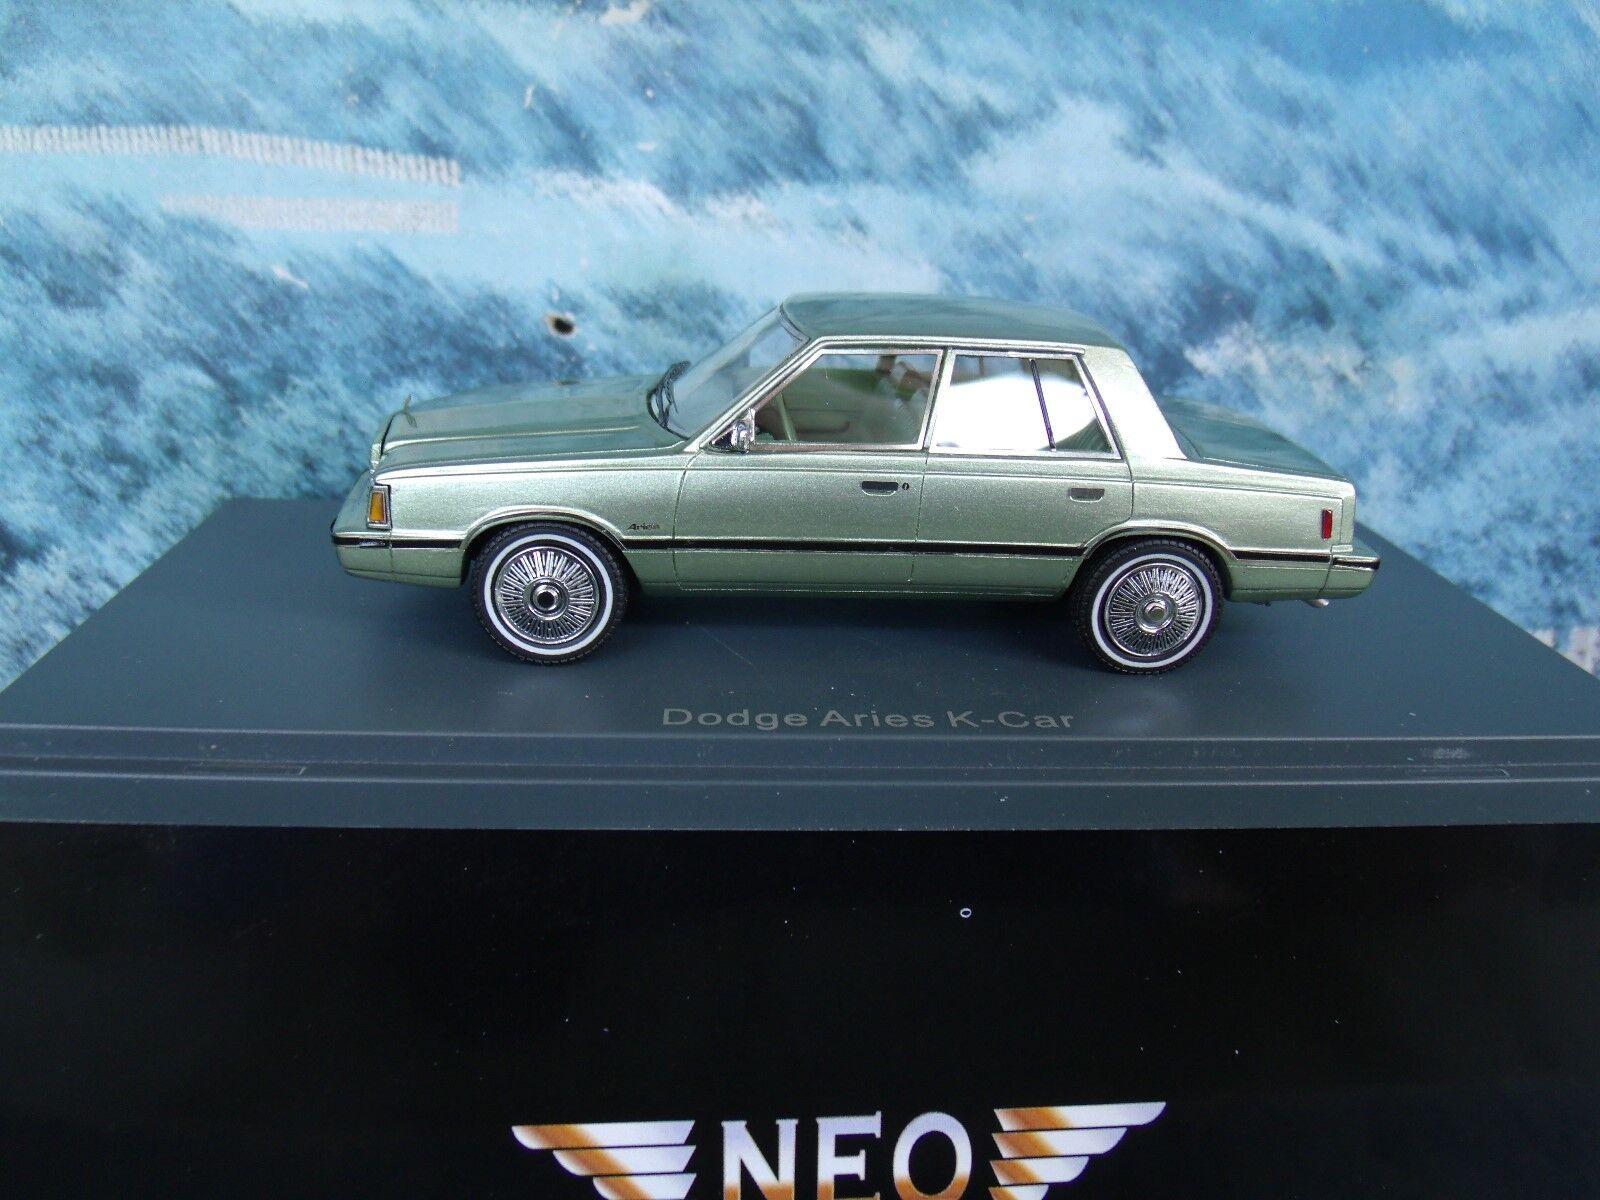 1 43  NEO  DODGE Aries, K-Car 1983